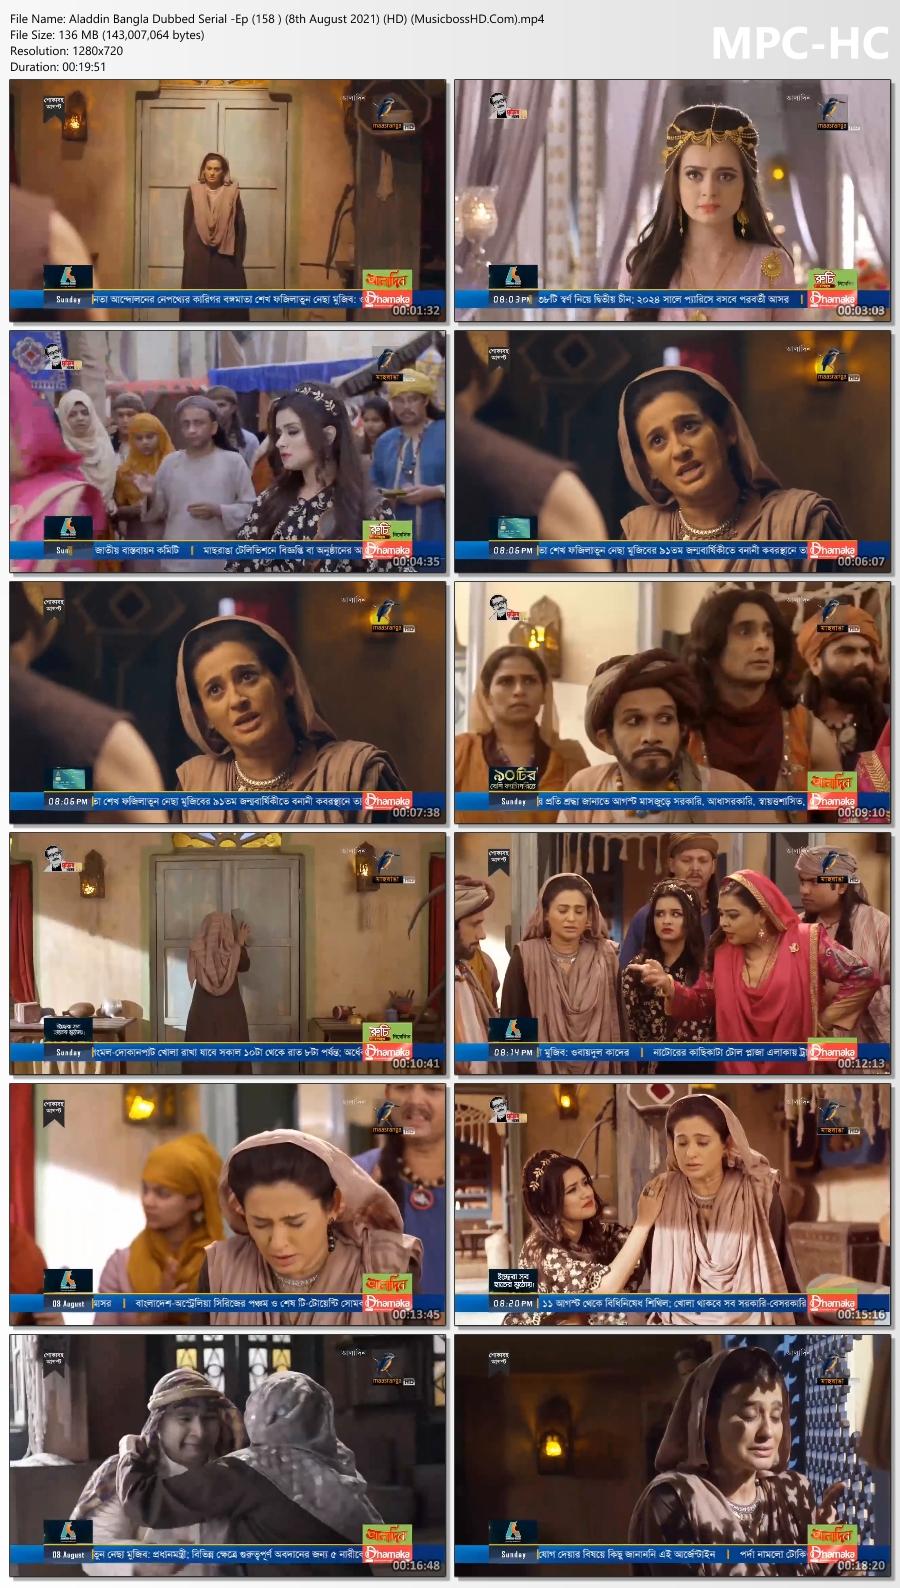 Aladdin-Bangla-Dubbed-Serial-Ep-158-8th-August-2021-HD-Musicboss-HD-Com-mp4-thumbs